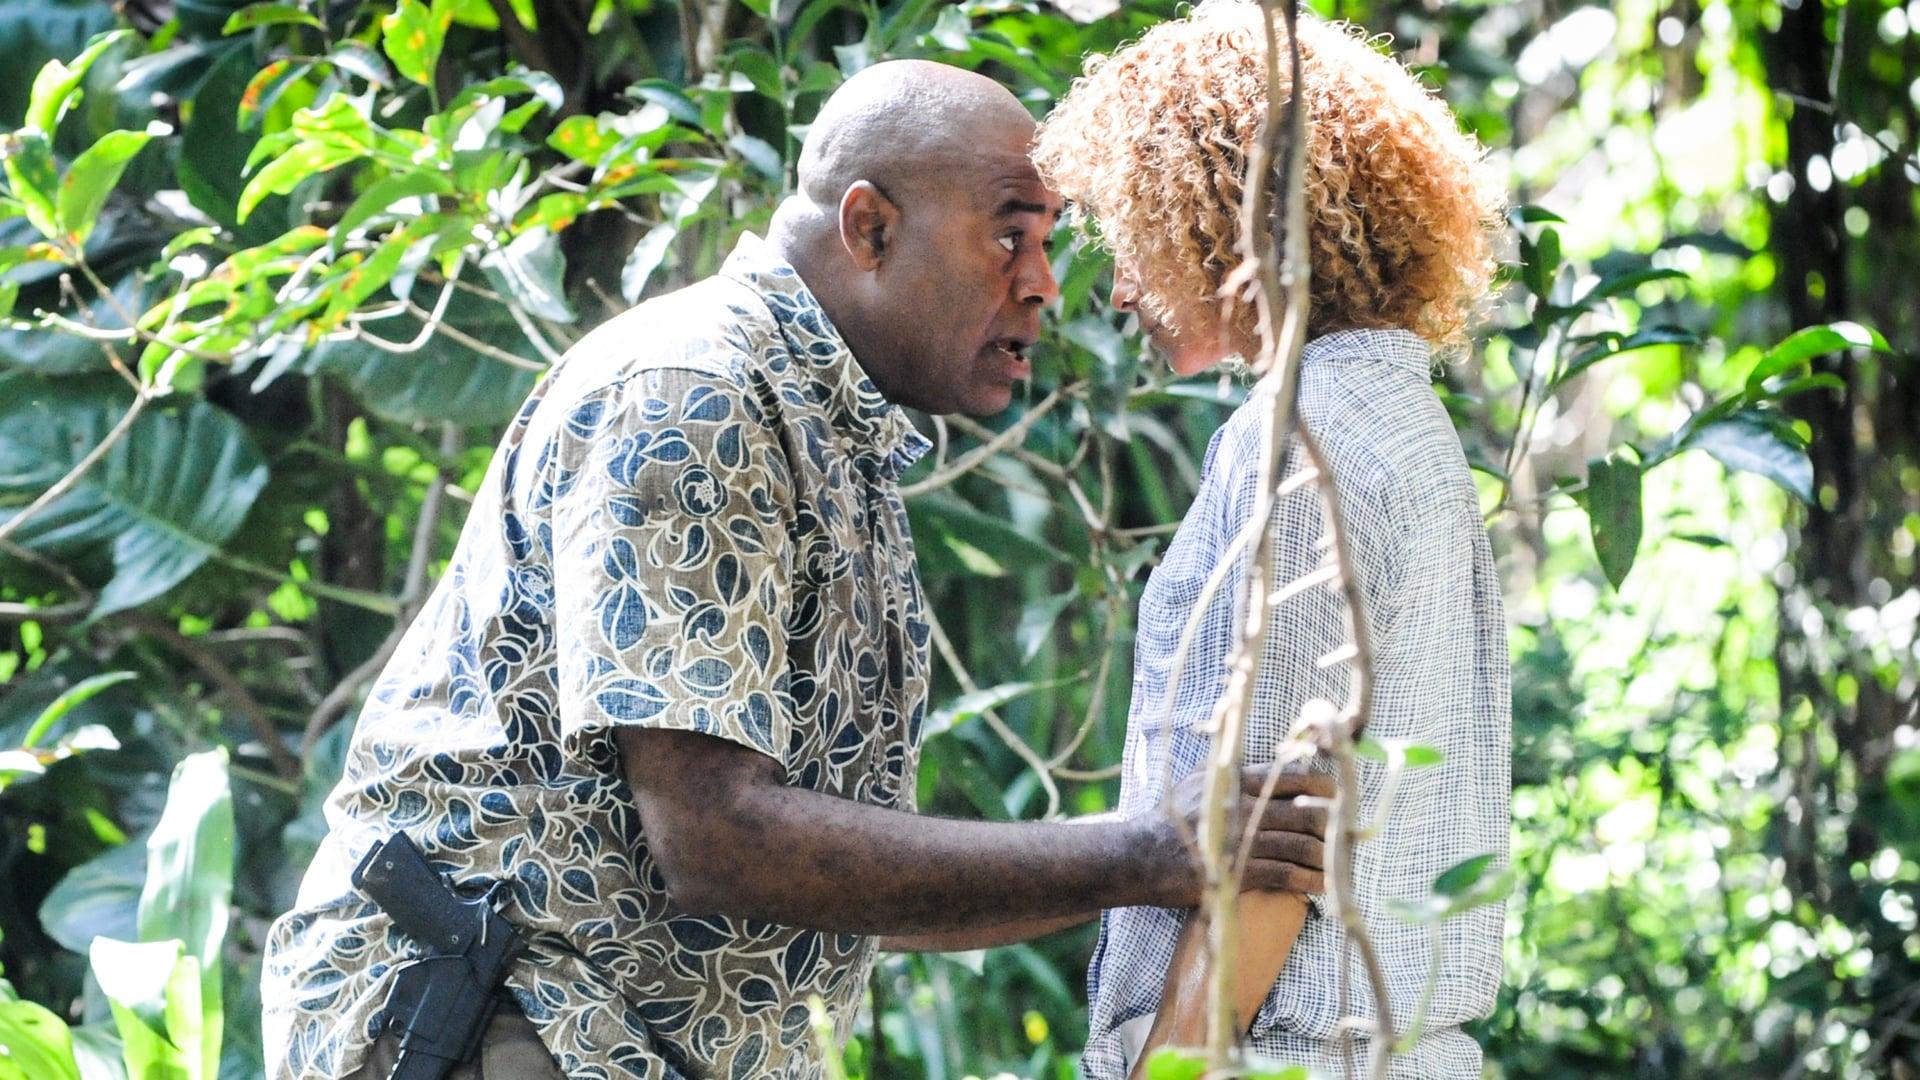 Hawaii Five-0 - Season 6 Episode 19 : Malama Ka Po'e (Care For One's People)